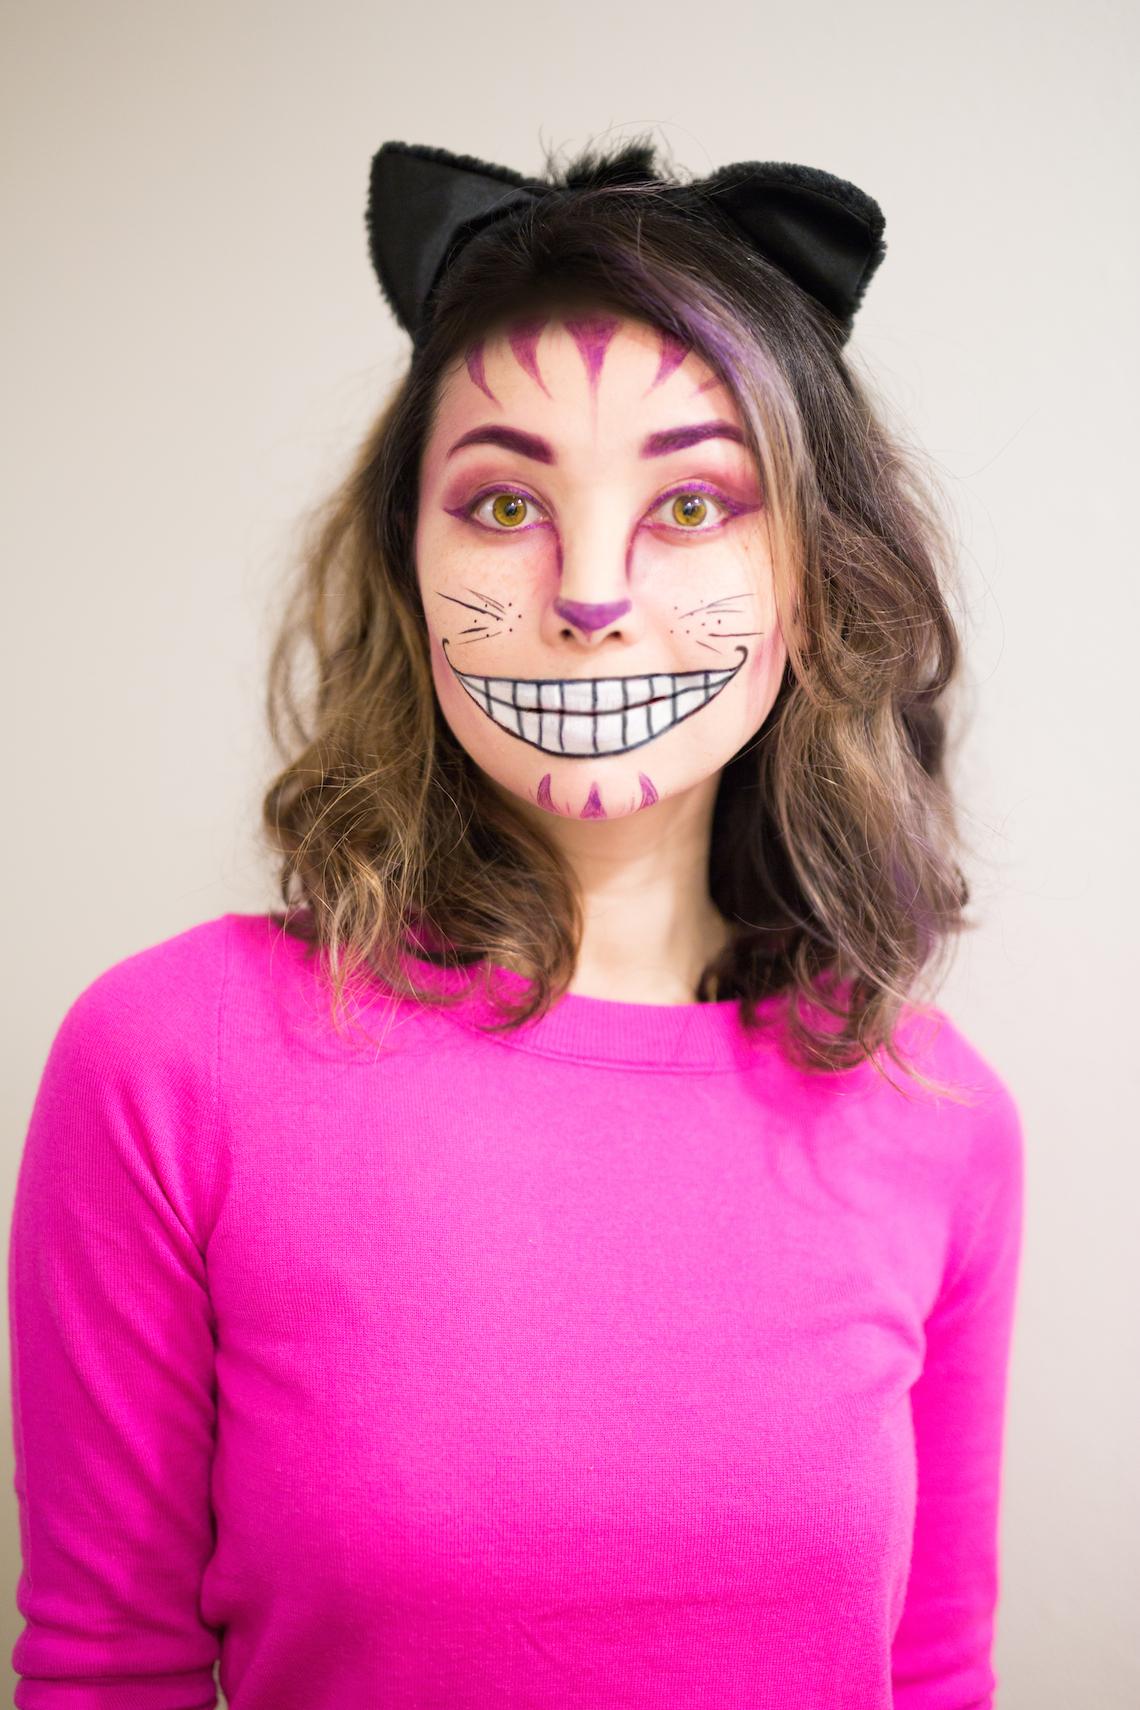 singapore_lifestyle_blog_halloween_costume_1 copy